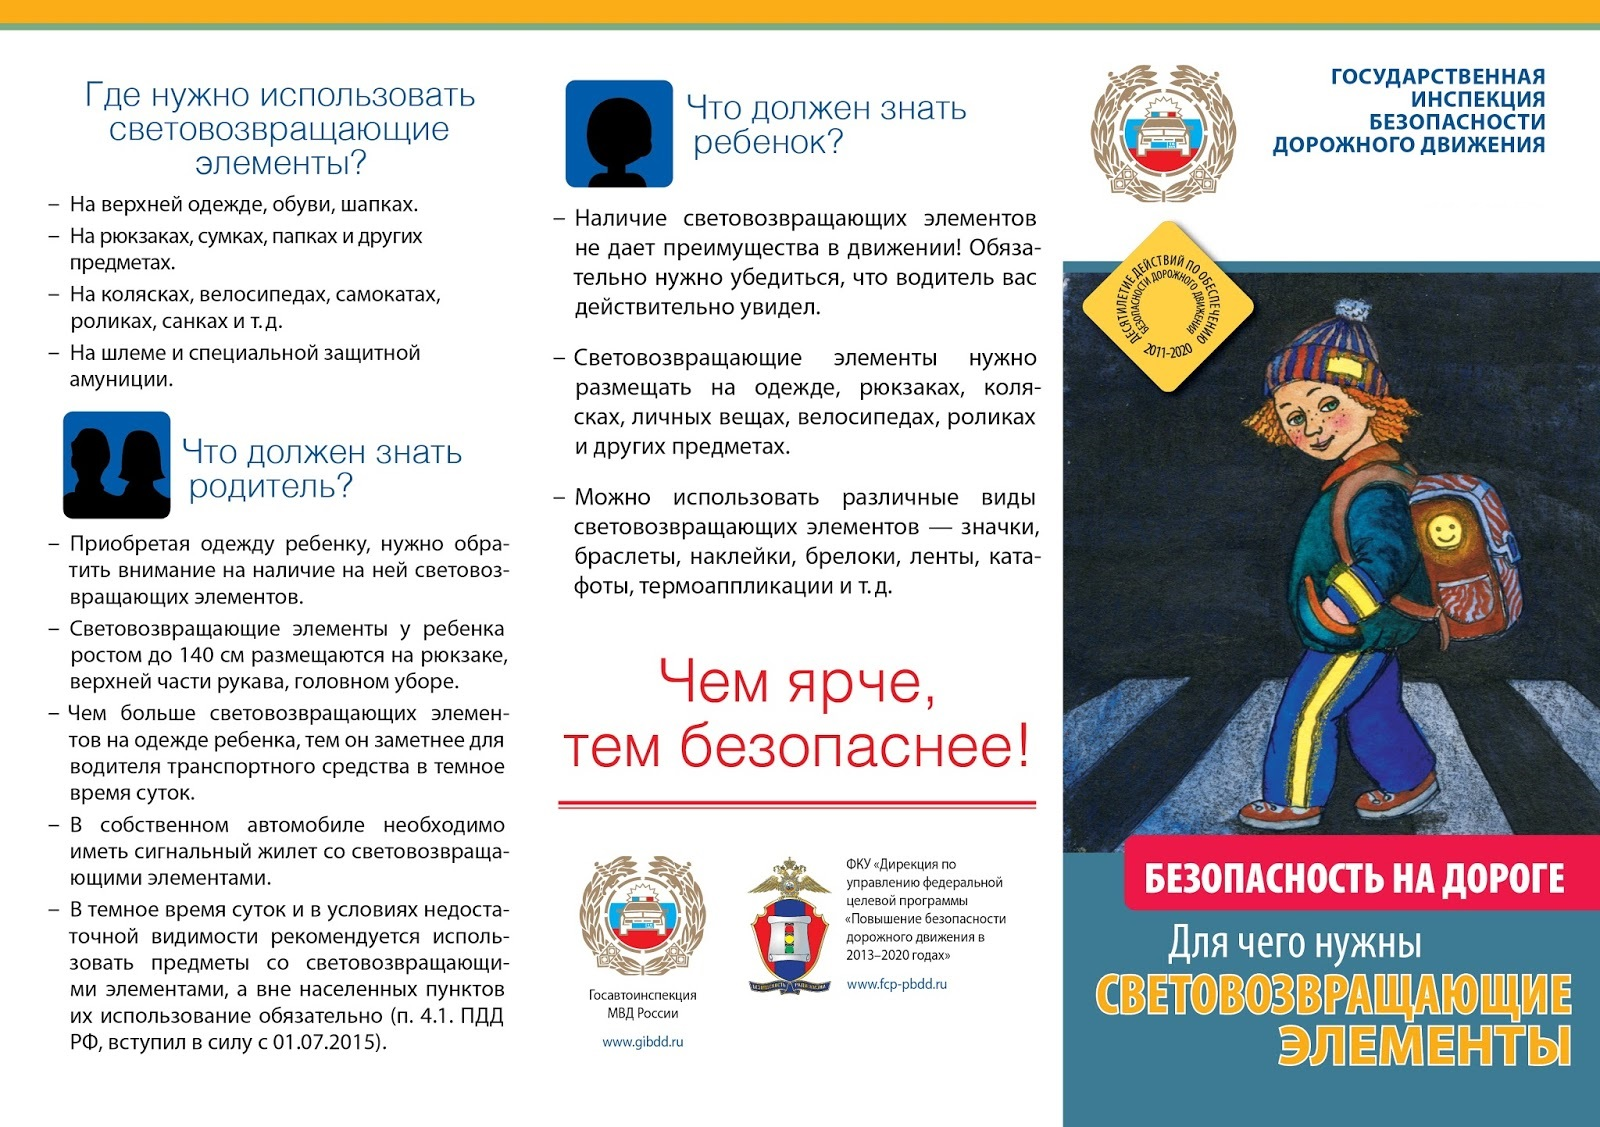 http://cdt-leninskii.ucoz.net/bezopasnost/5b968d58195e4861166011.jpg